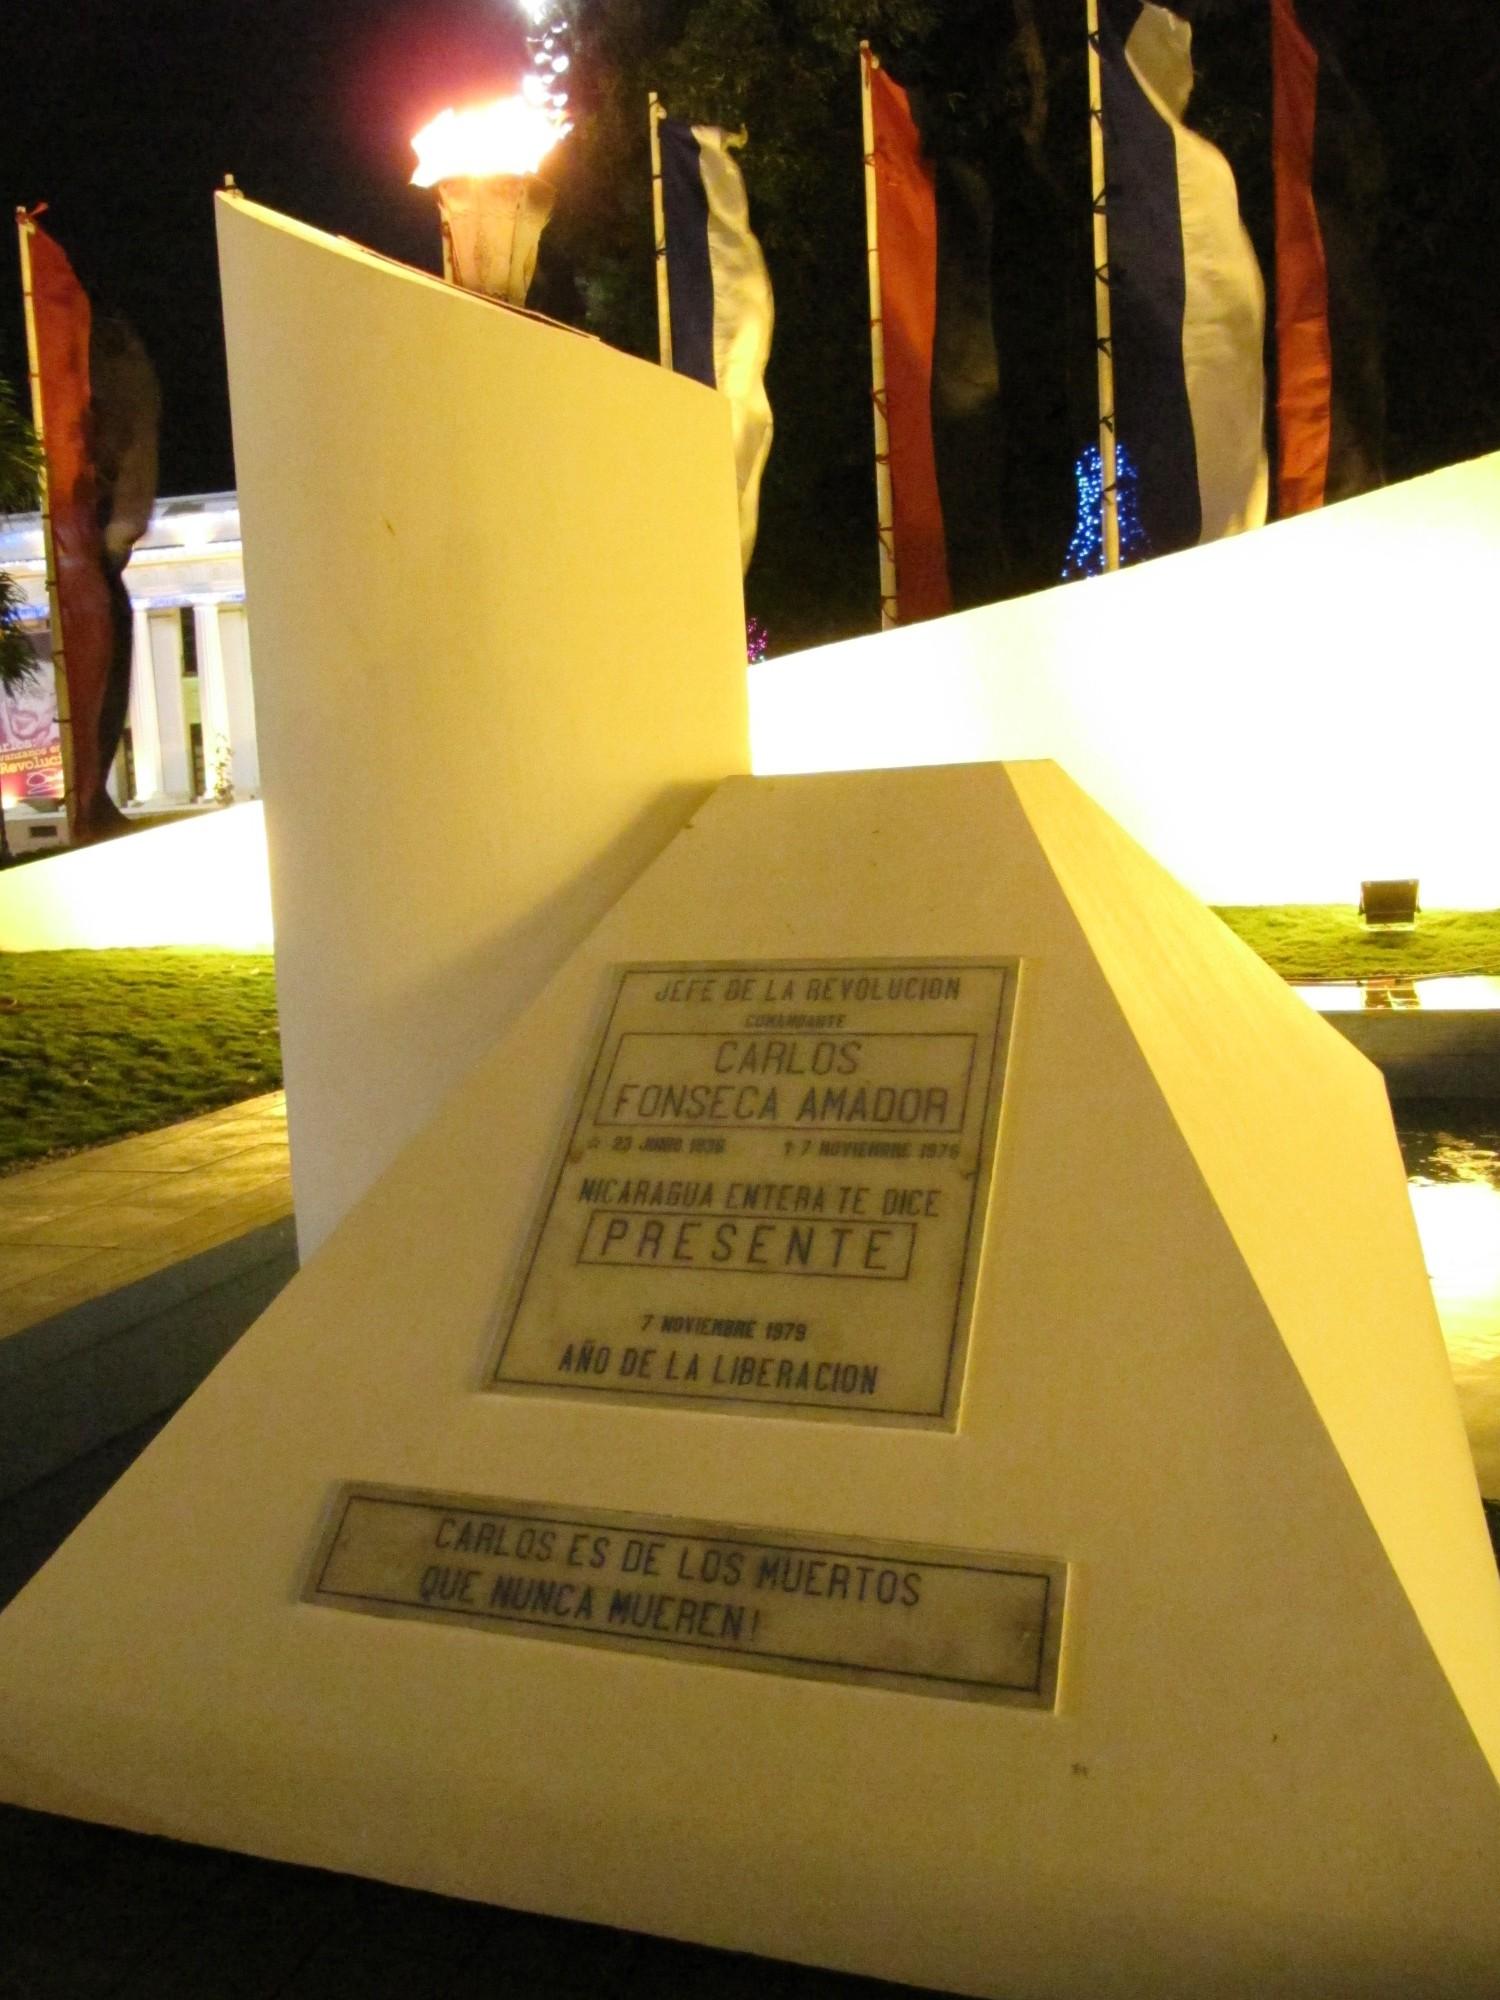 Monumento a Carlos Fonseca, Managua, 2013